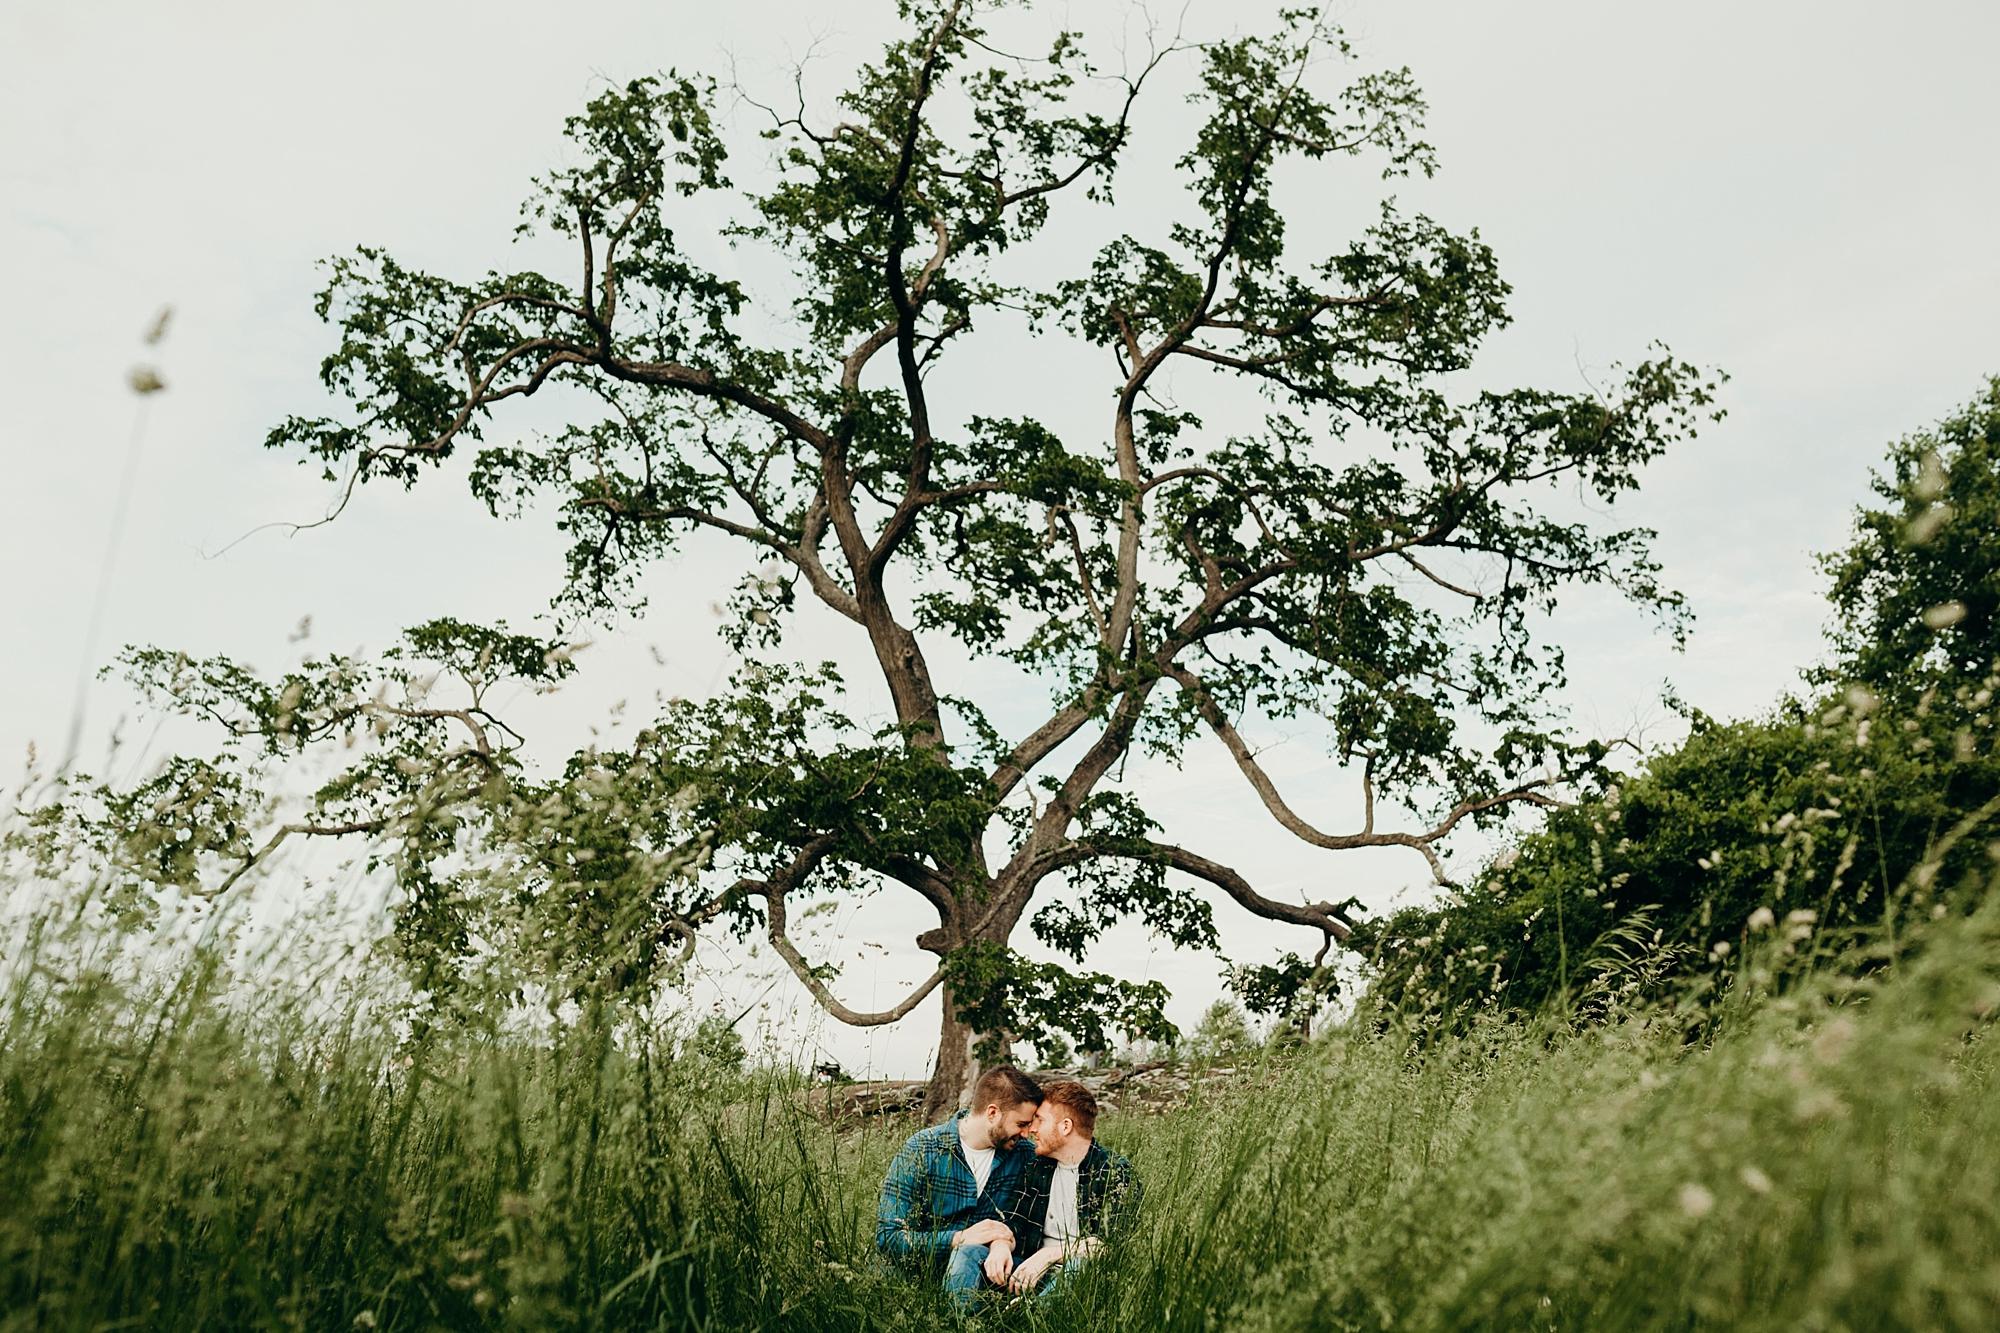 Joe_Mac_Creative_Wedding_Engagement_Philadelphia_Philly_Photography_LGBT_Gay_Penn_State___0028.jpg